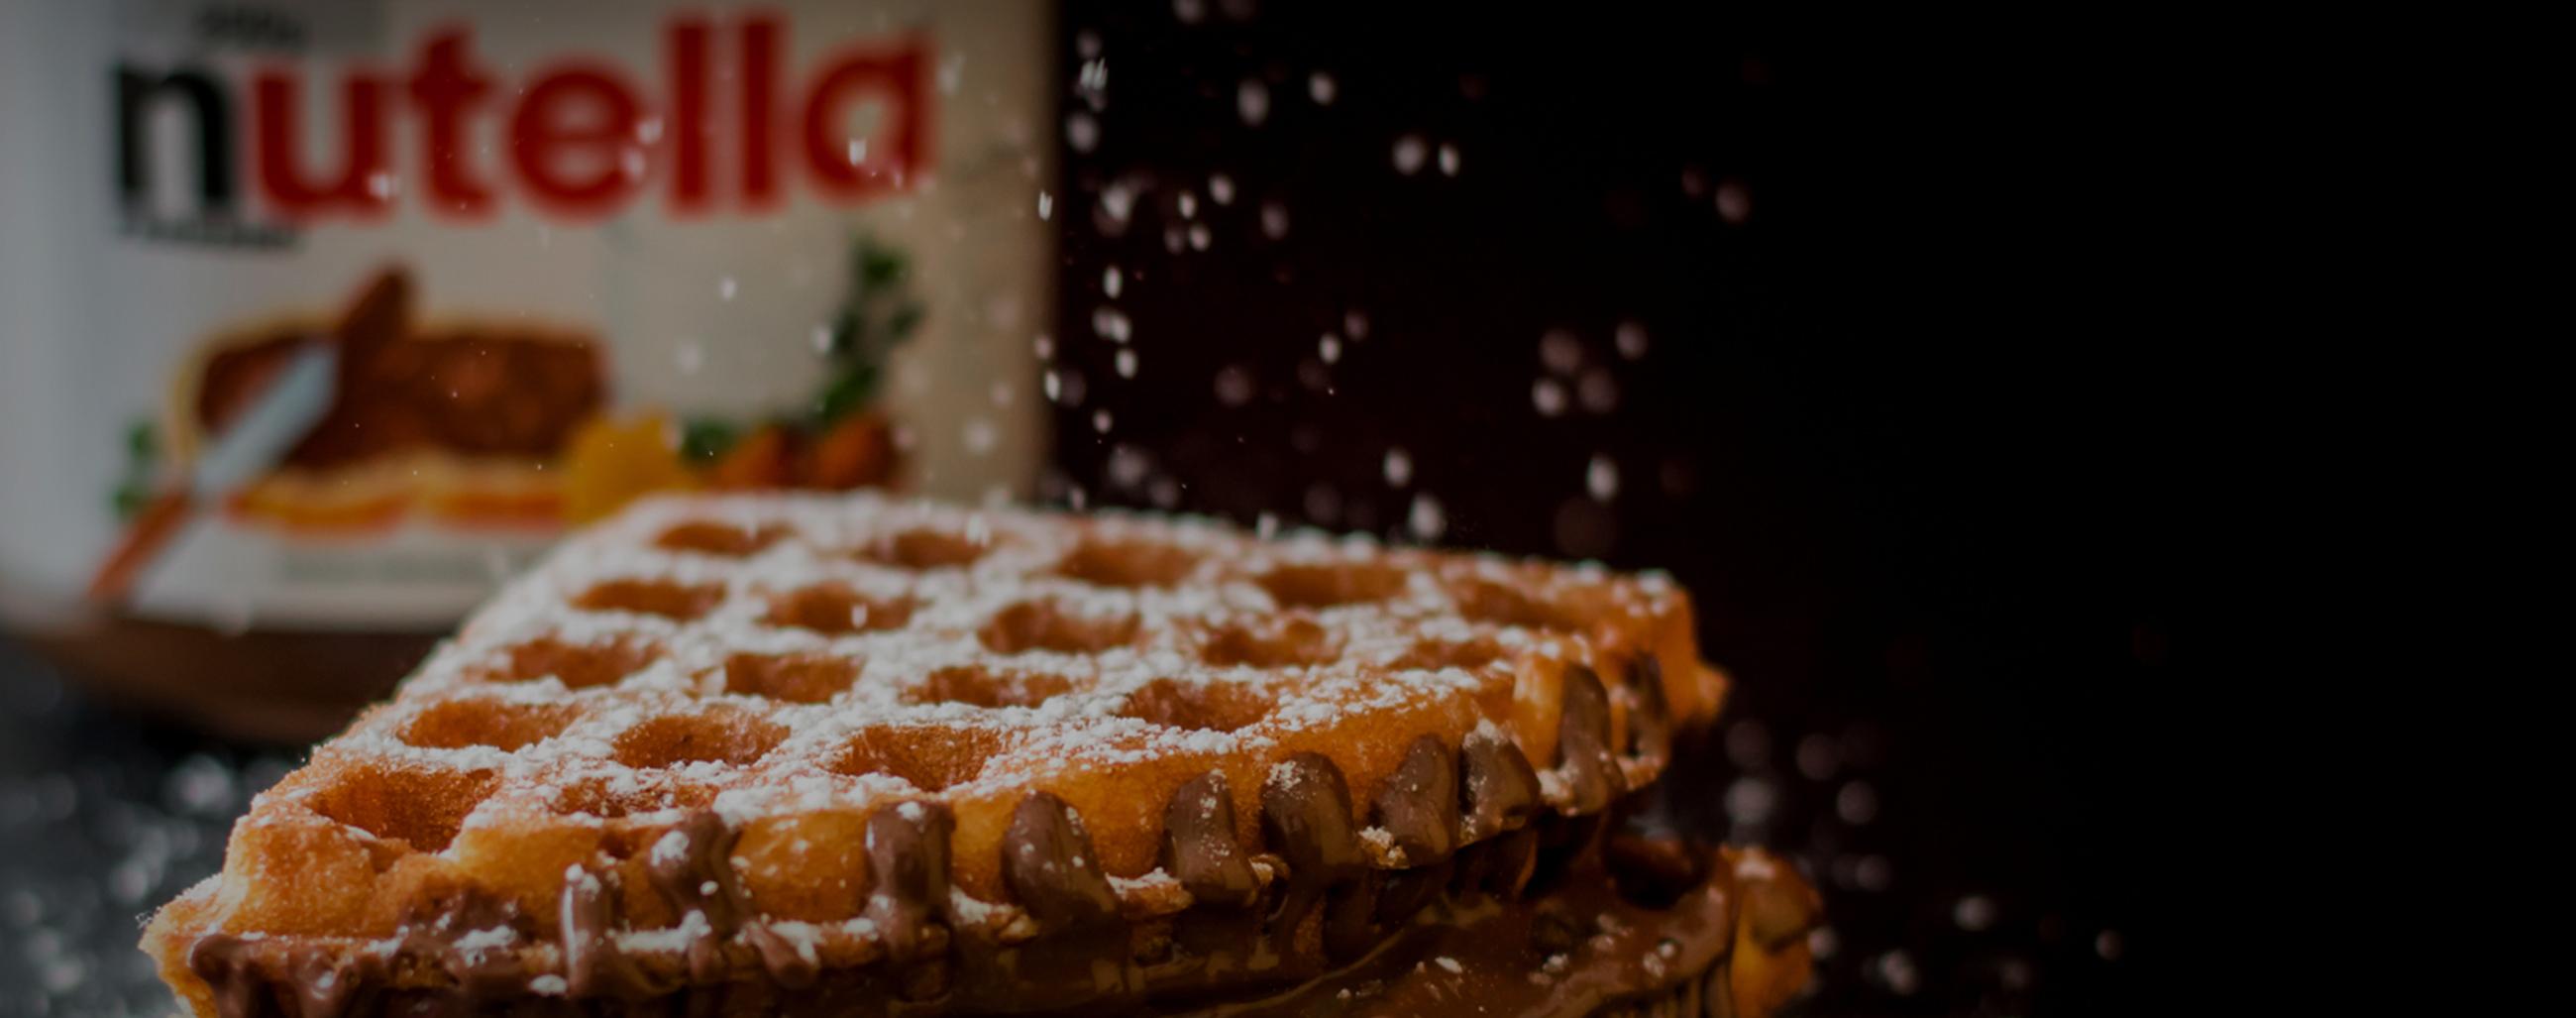 Nutella Importer & Distributor